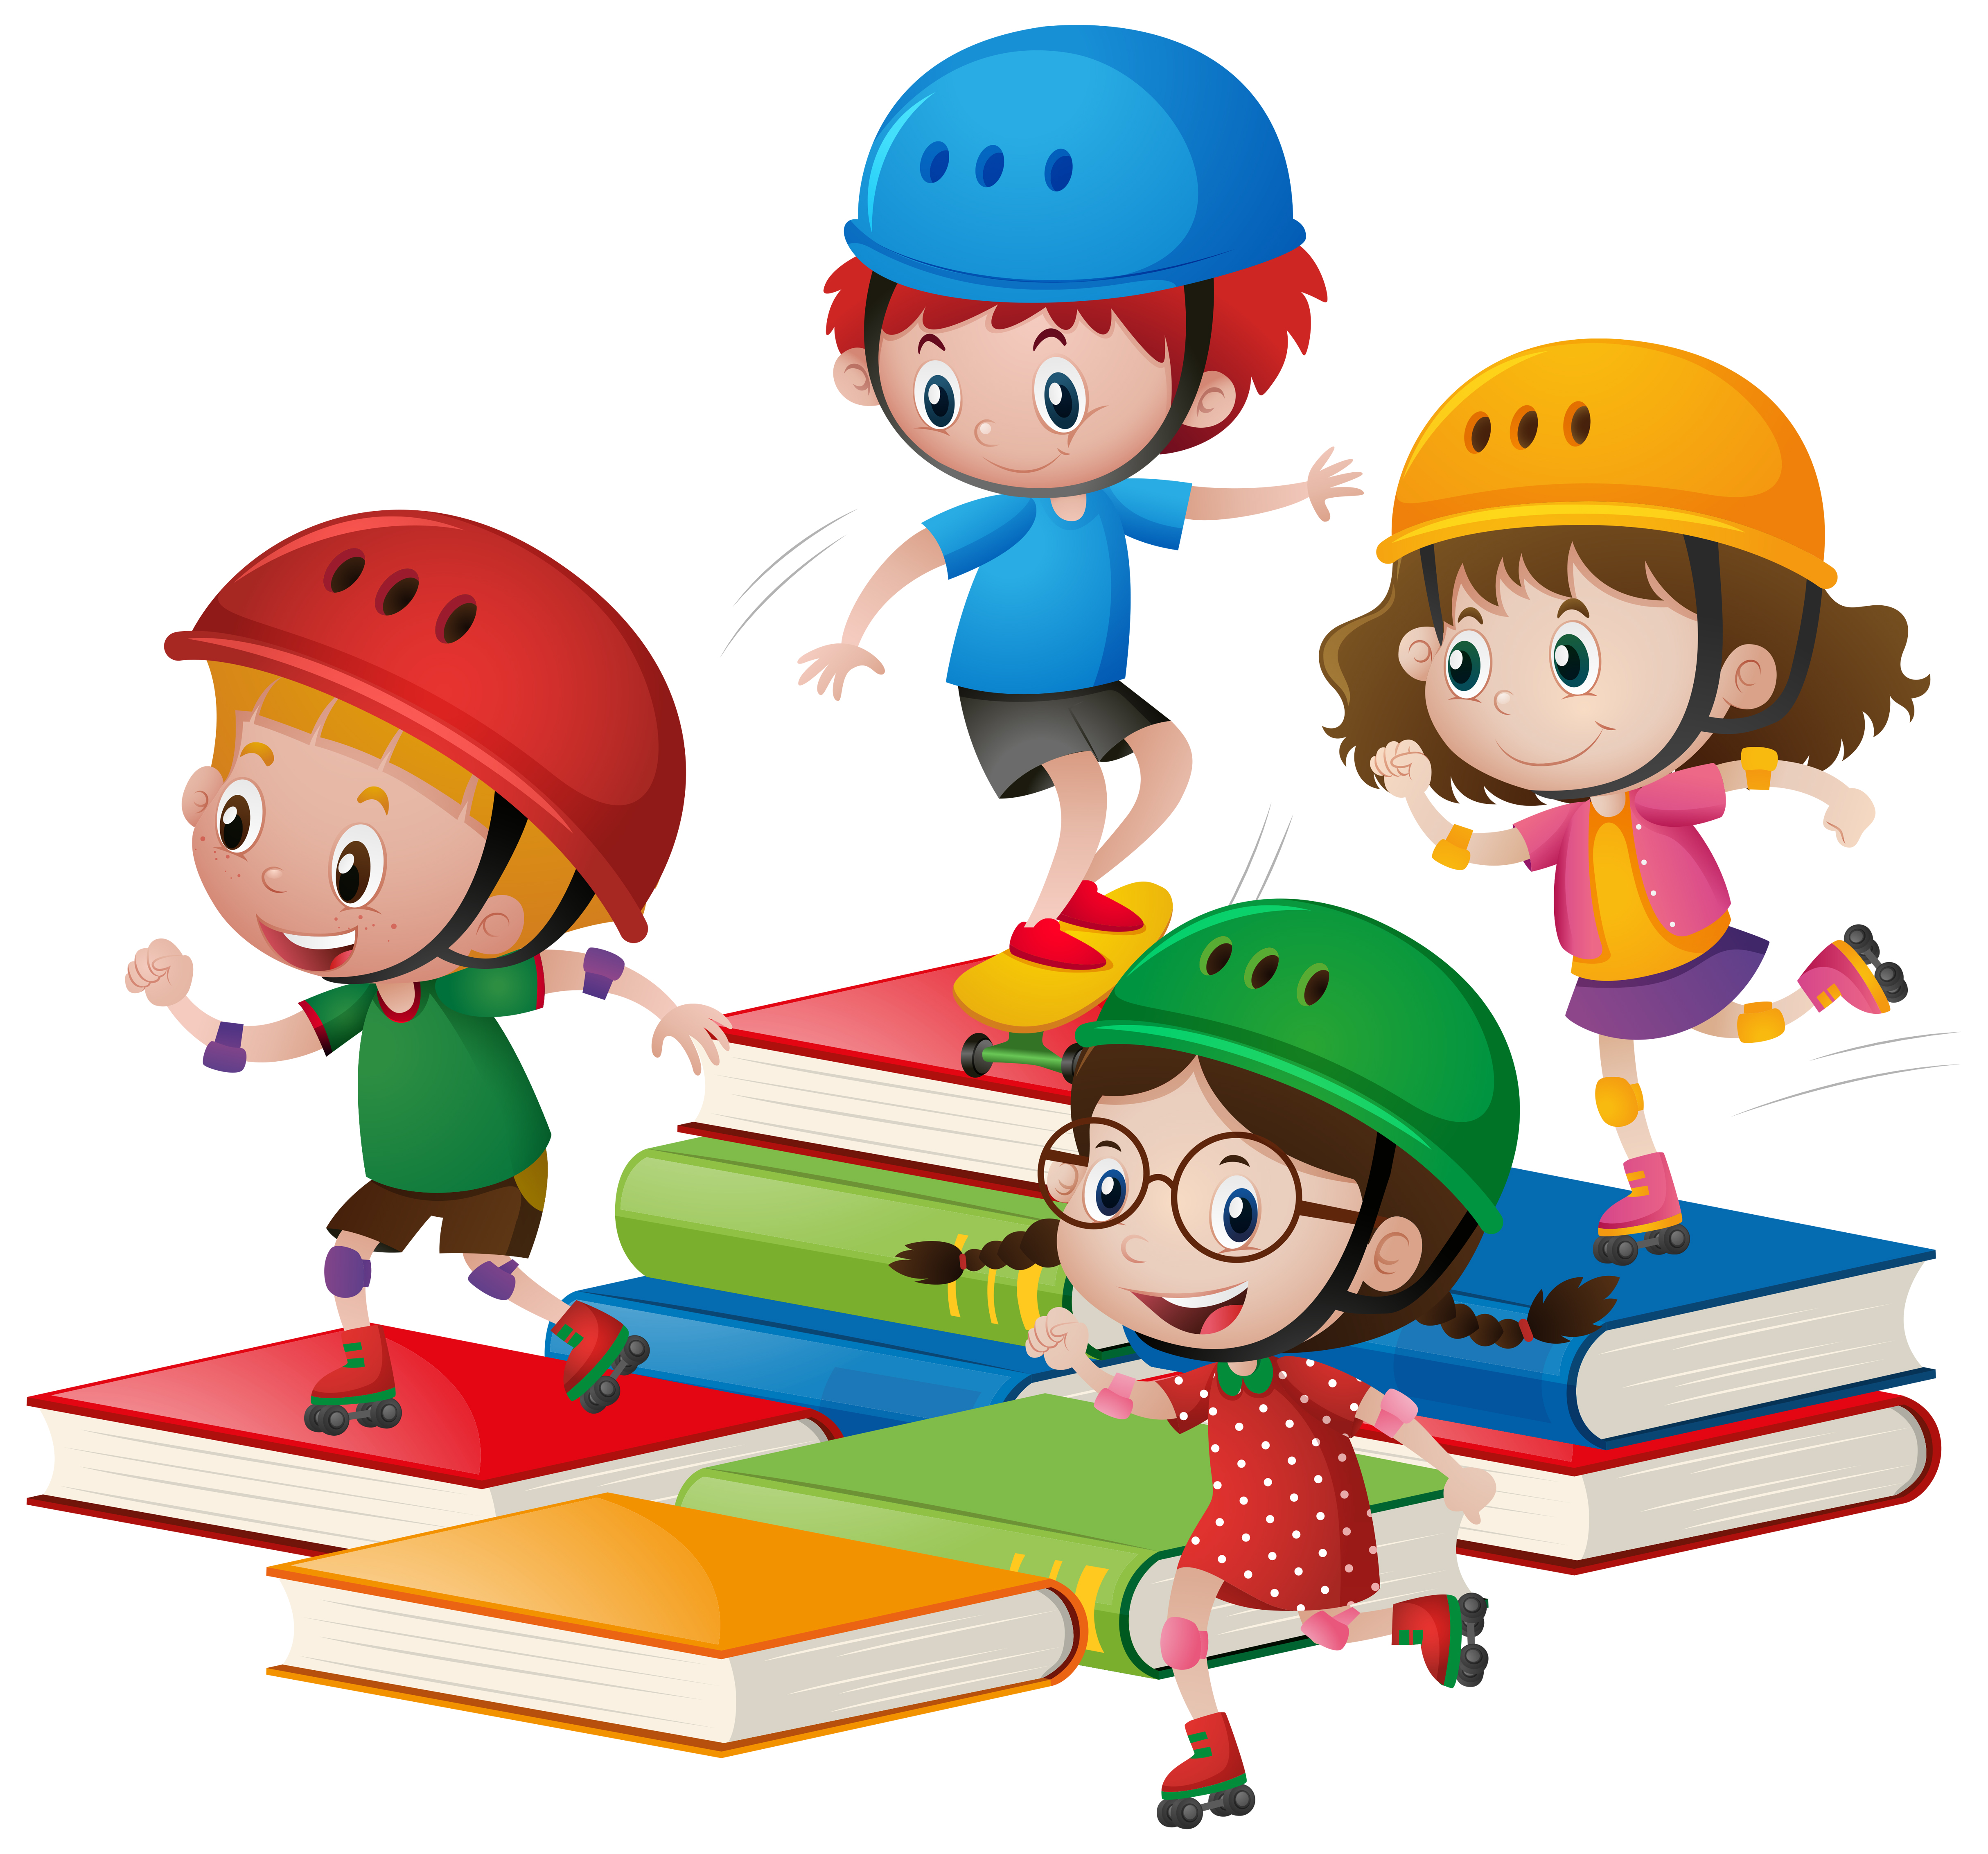 Kids rollerskate on big books - Download Free Vectors ...